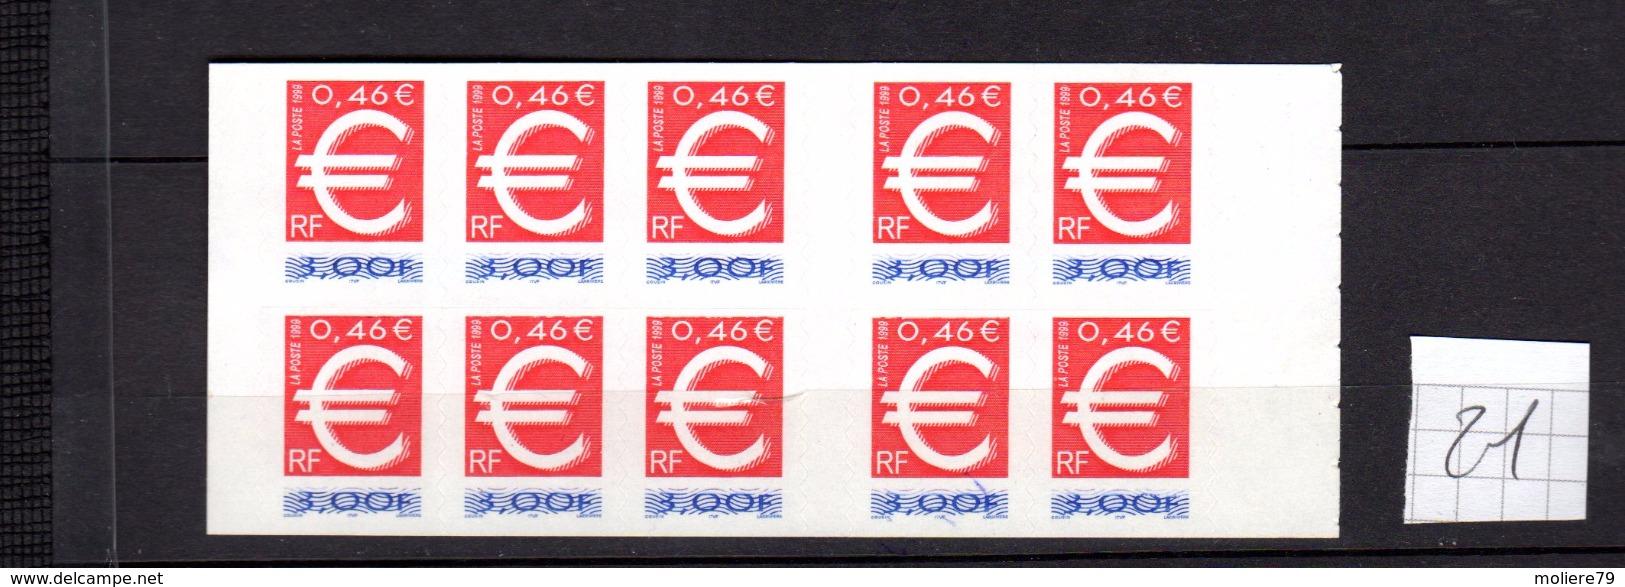 Carnet BC 3215 C 1 , L'EURO NEUF, - Commémoratifs